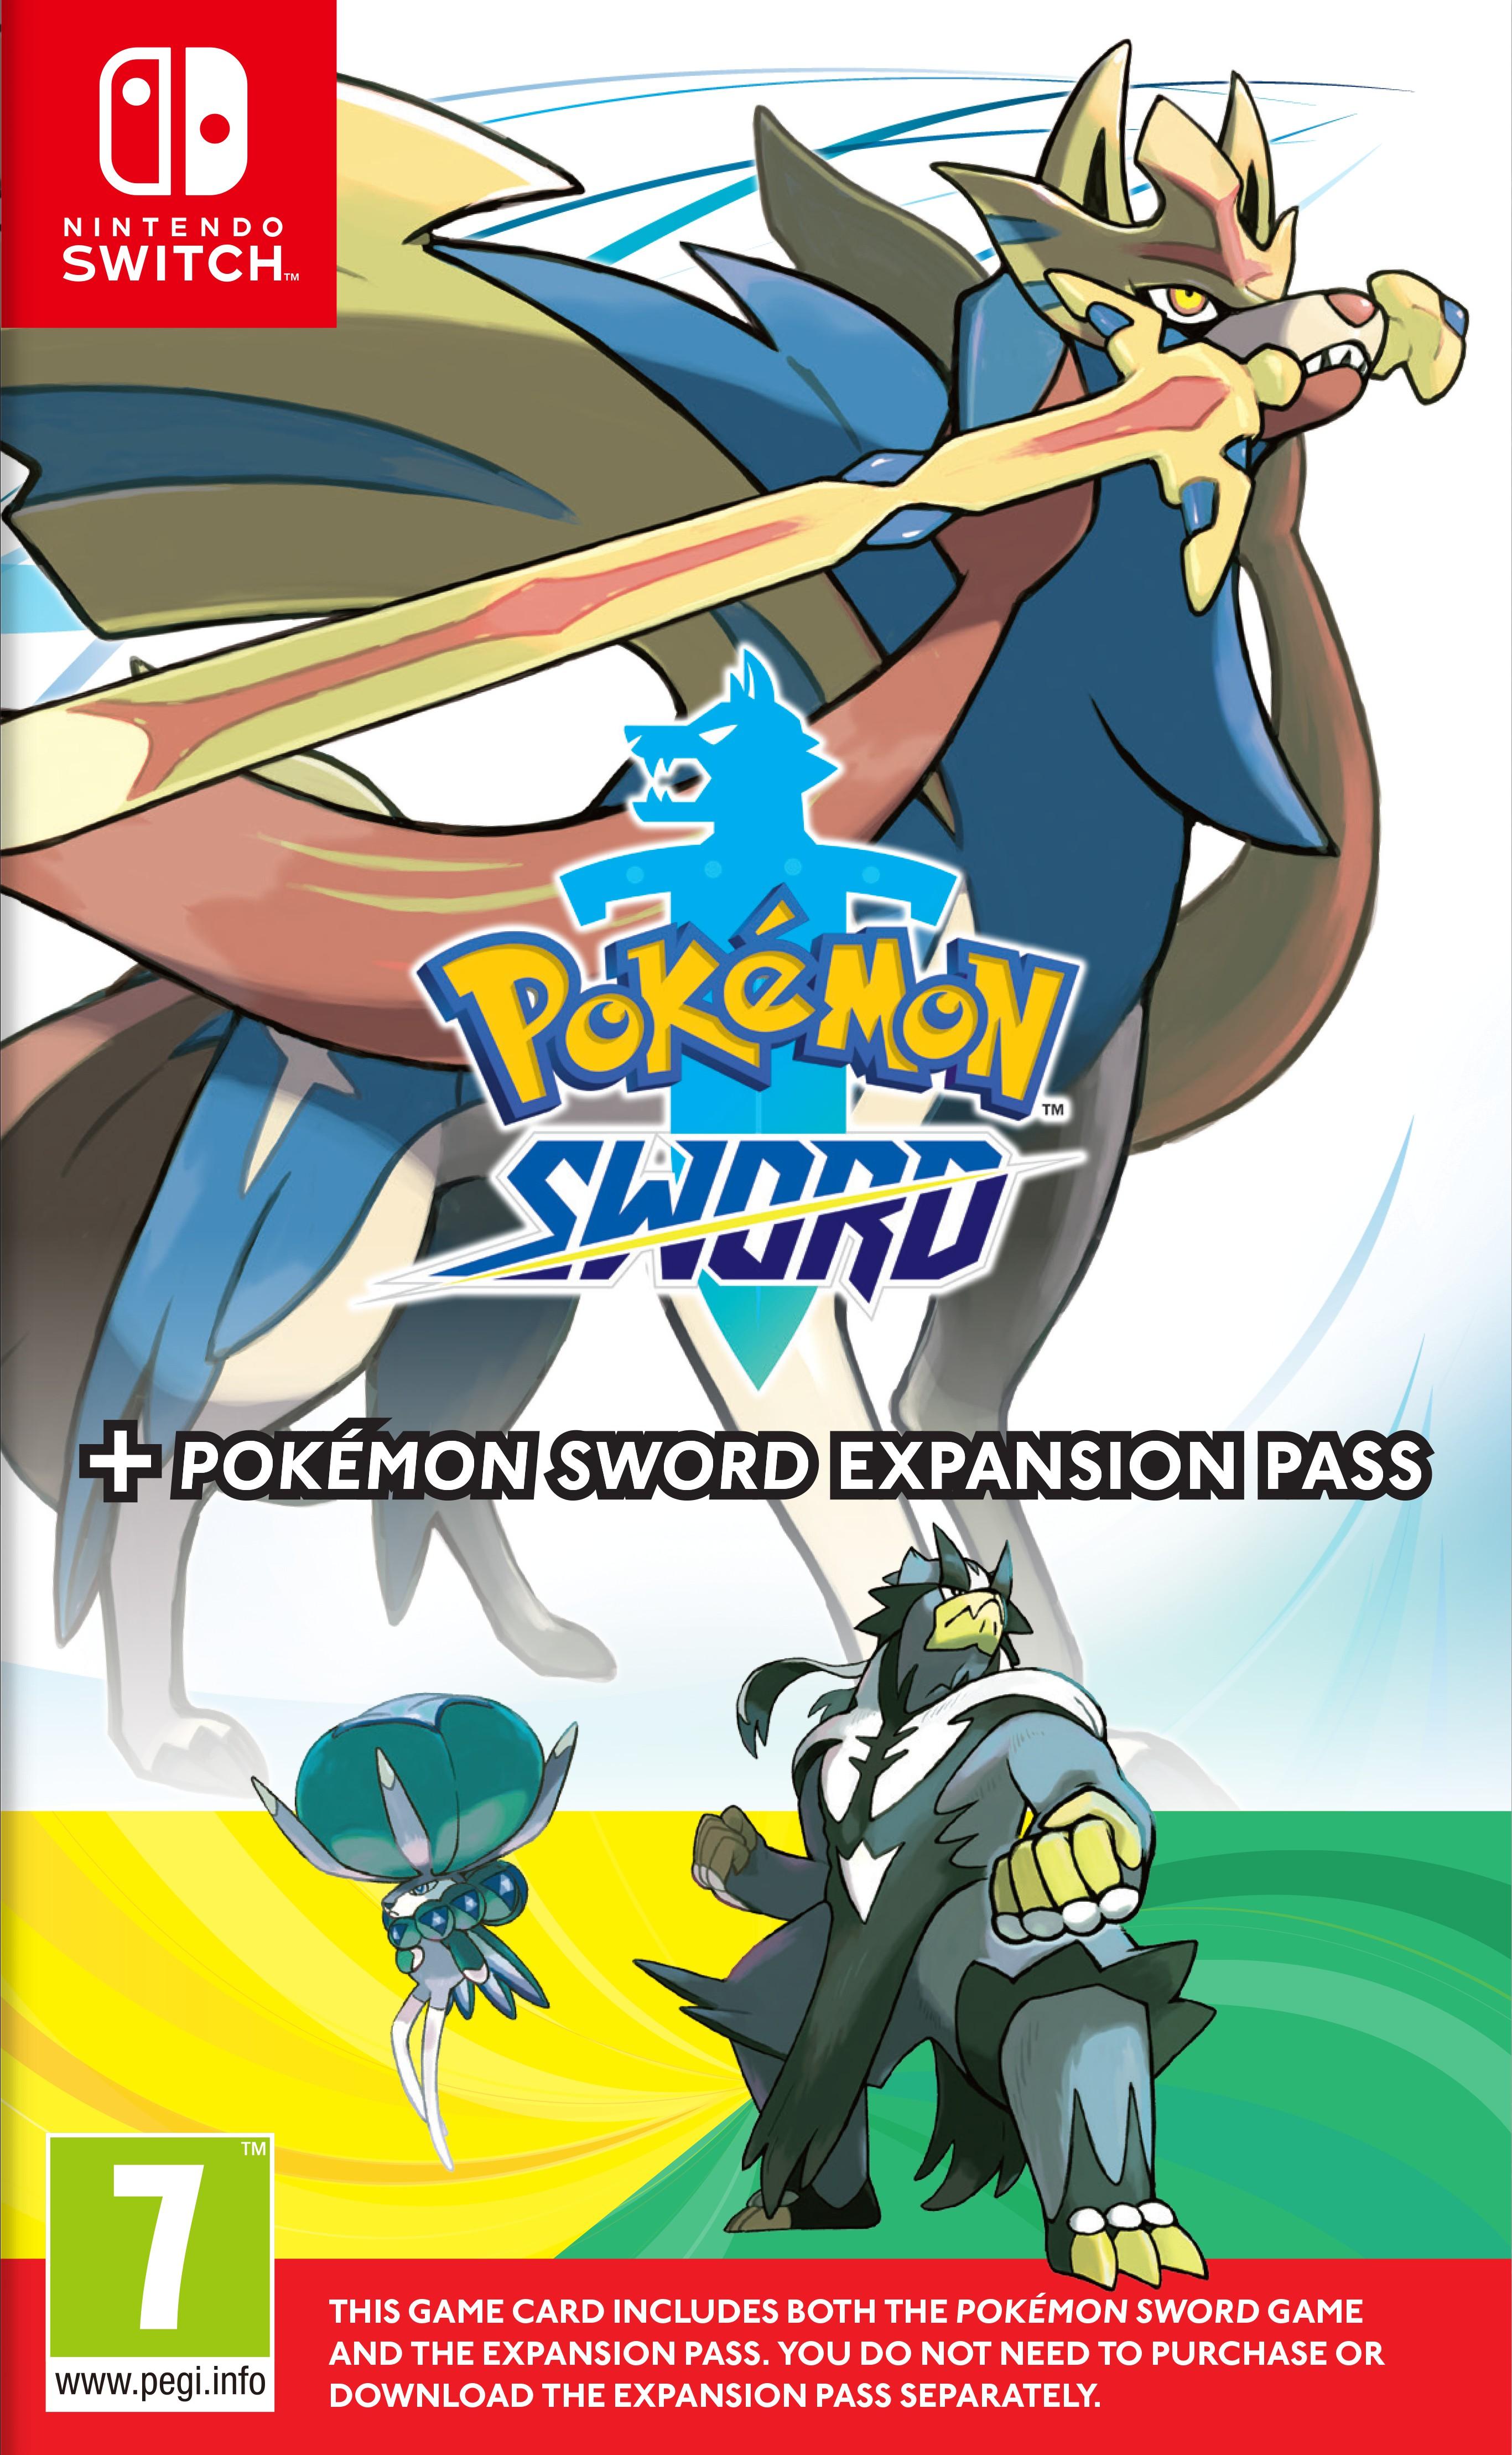 Pokemon Sword + Expansion Pass